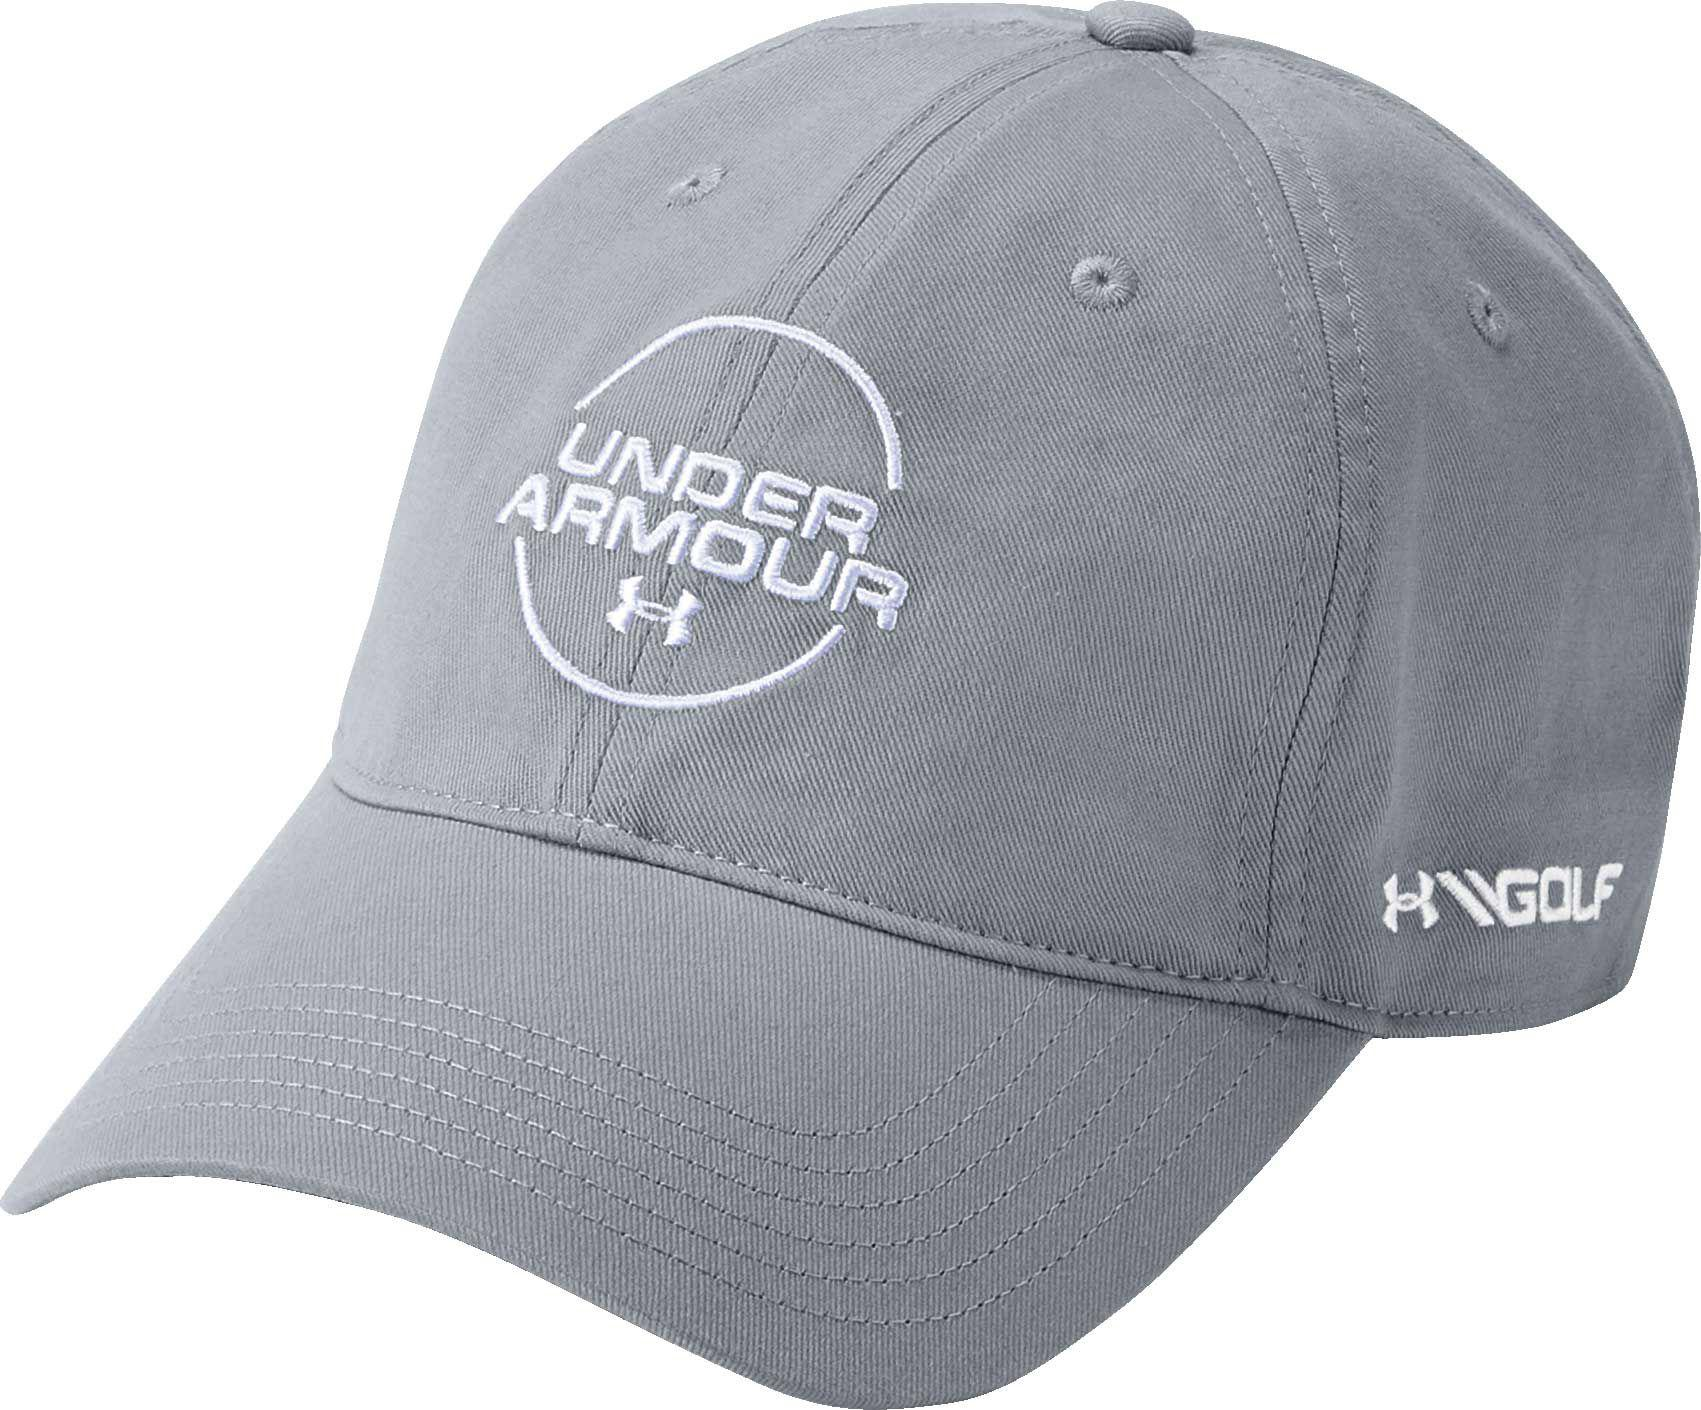 948a10cfae1 Lyst - Under Armour Jordan Spieth Washed Cotton Golf Hat in Gray for Men